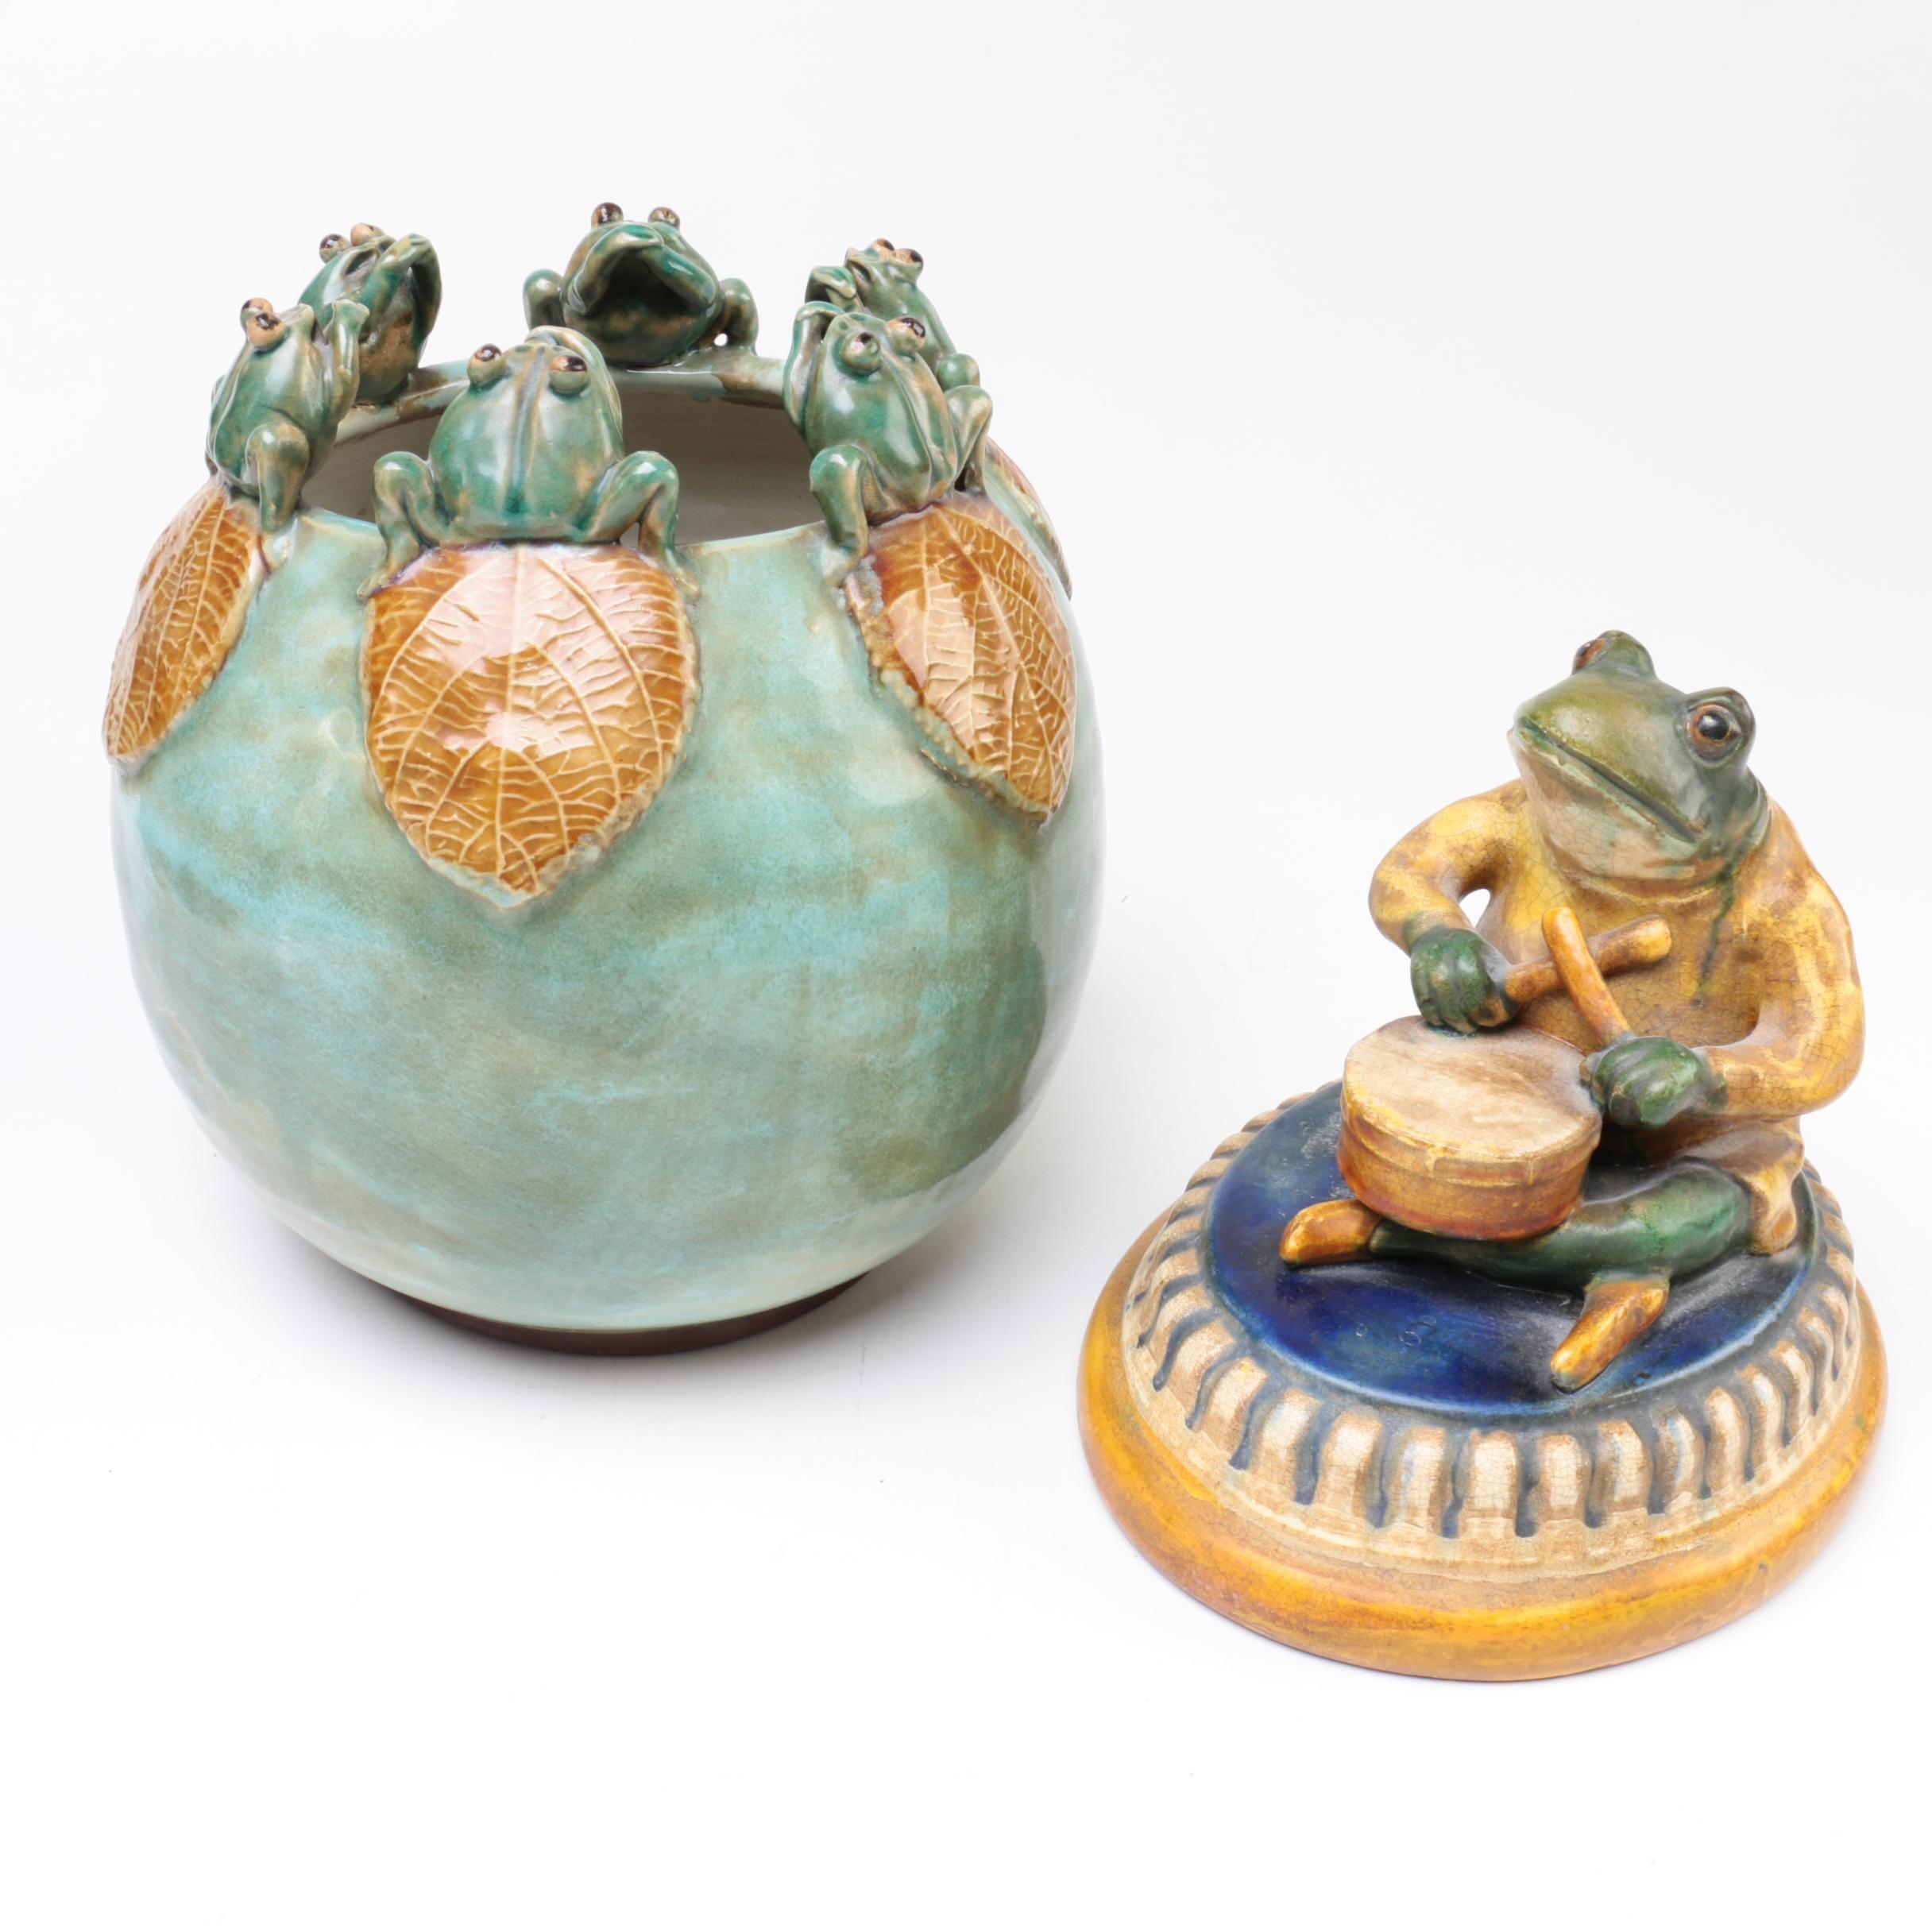 Decorative Ceramic Items with Frog Motif